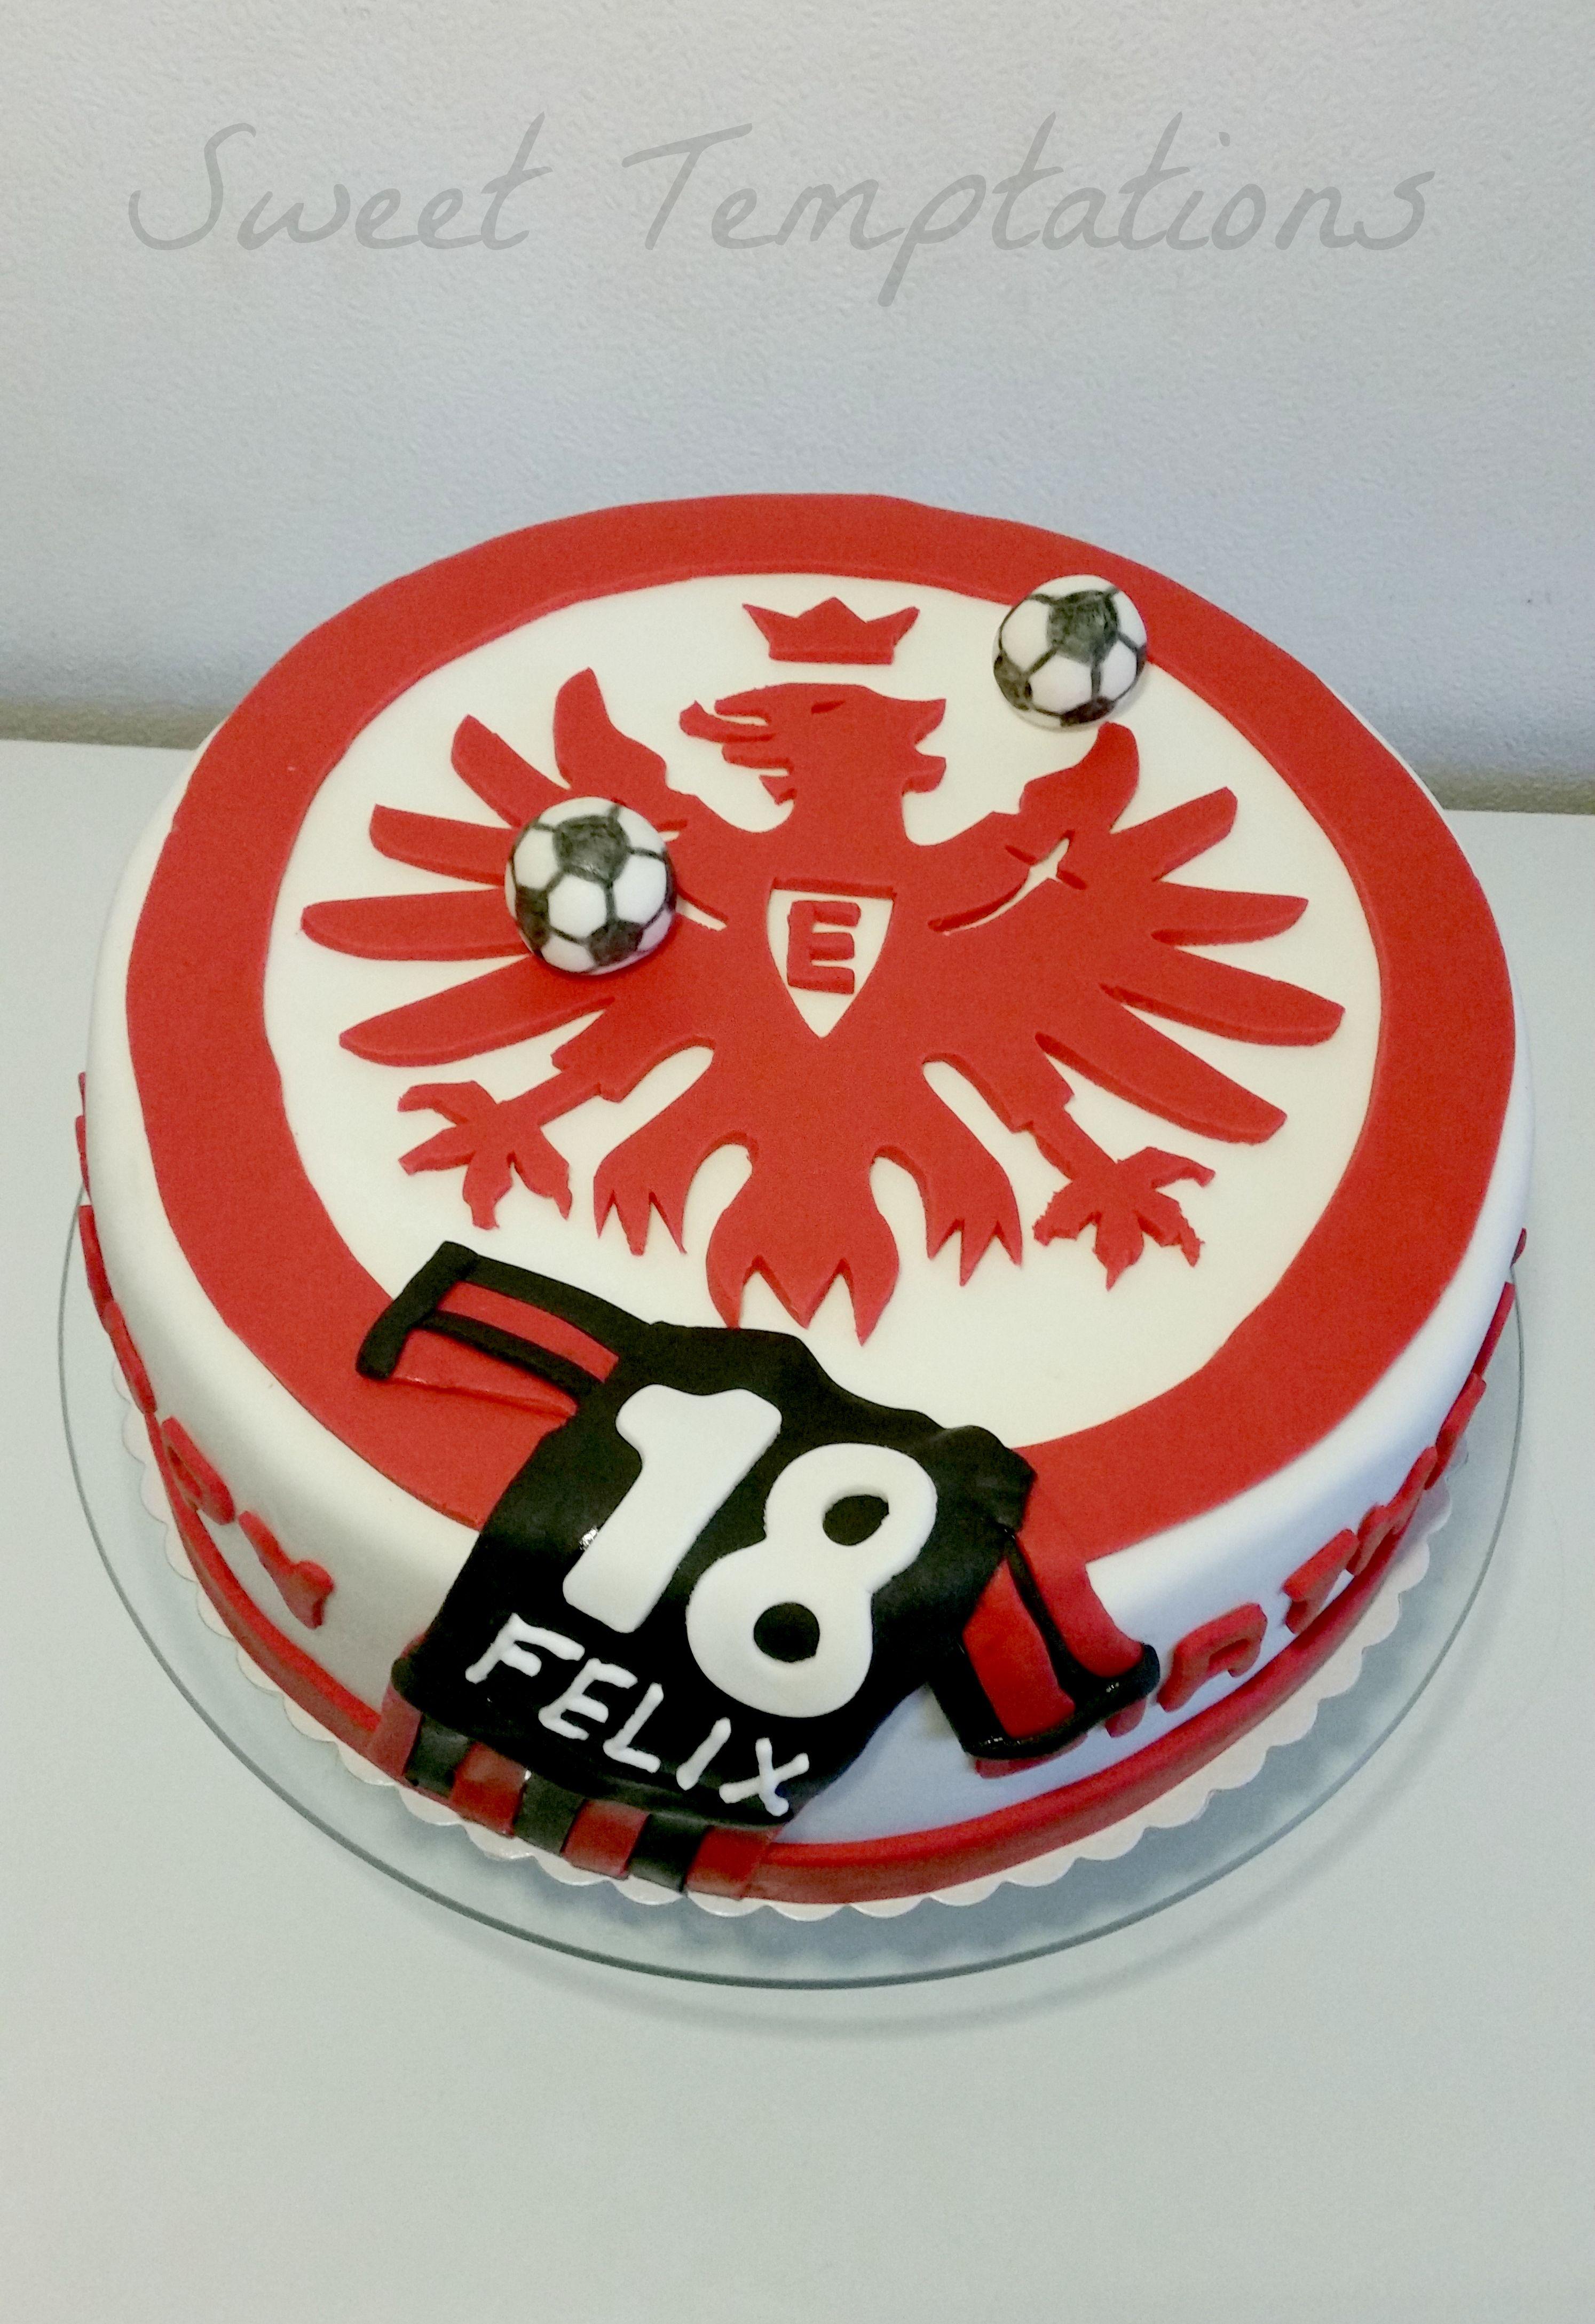 Soccer eintracht frankfurt cake german soccer cake for a for Kuchen frankfurt